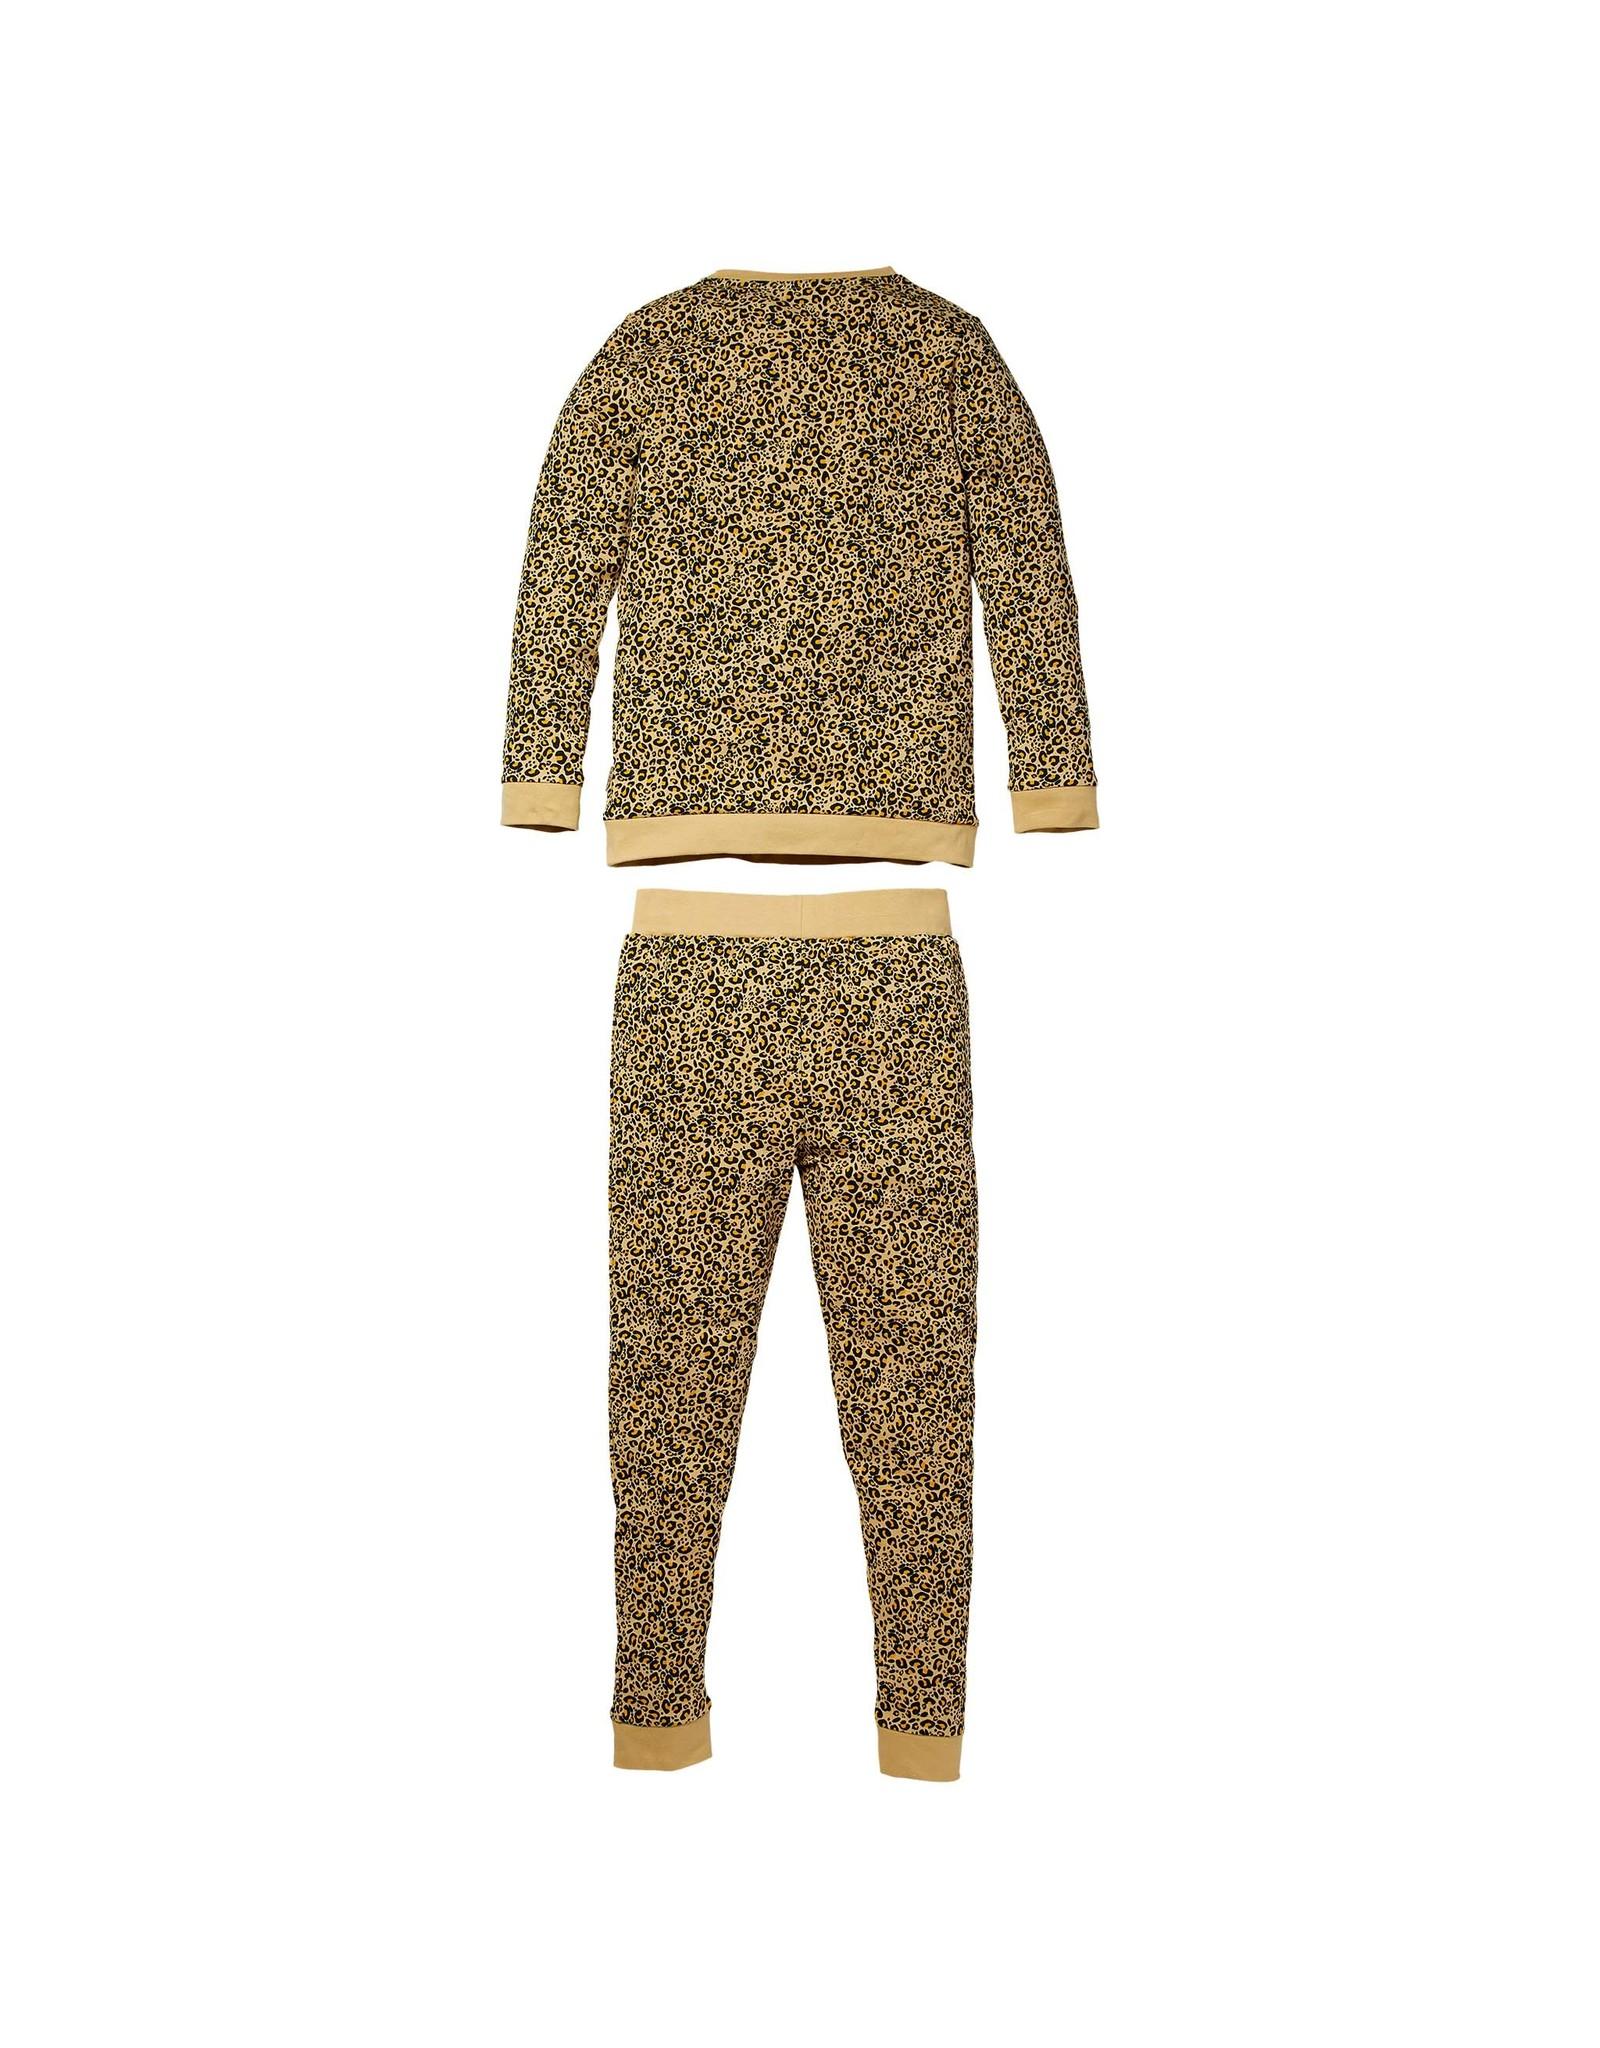 Quapi Quapi meisjes pyjama Puck Sand Leopard aop